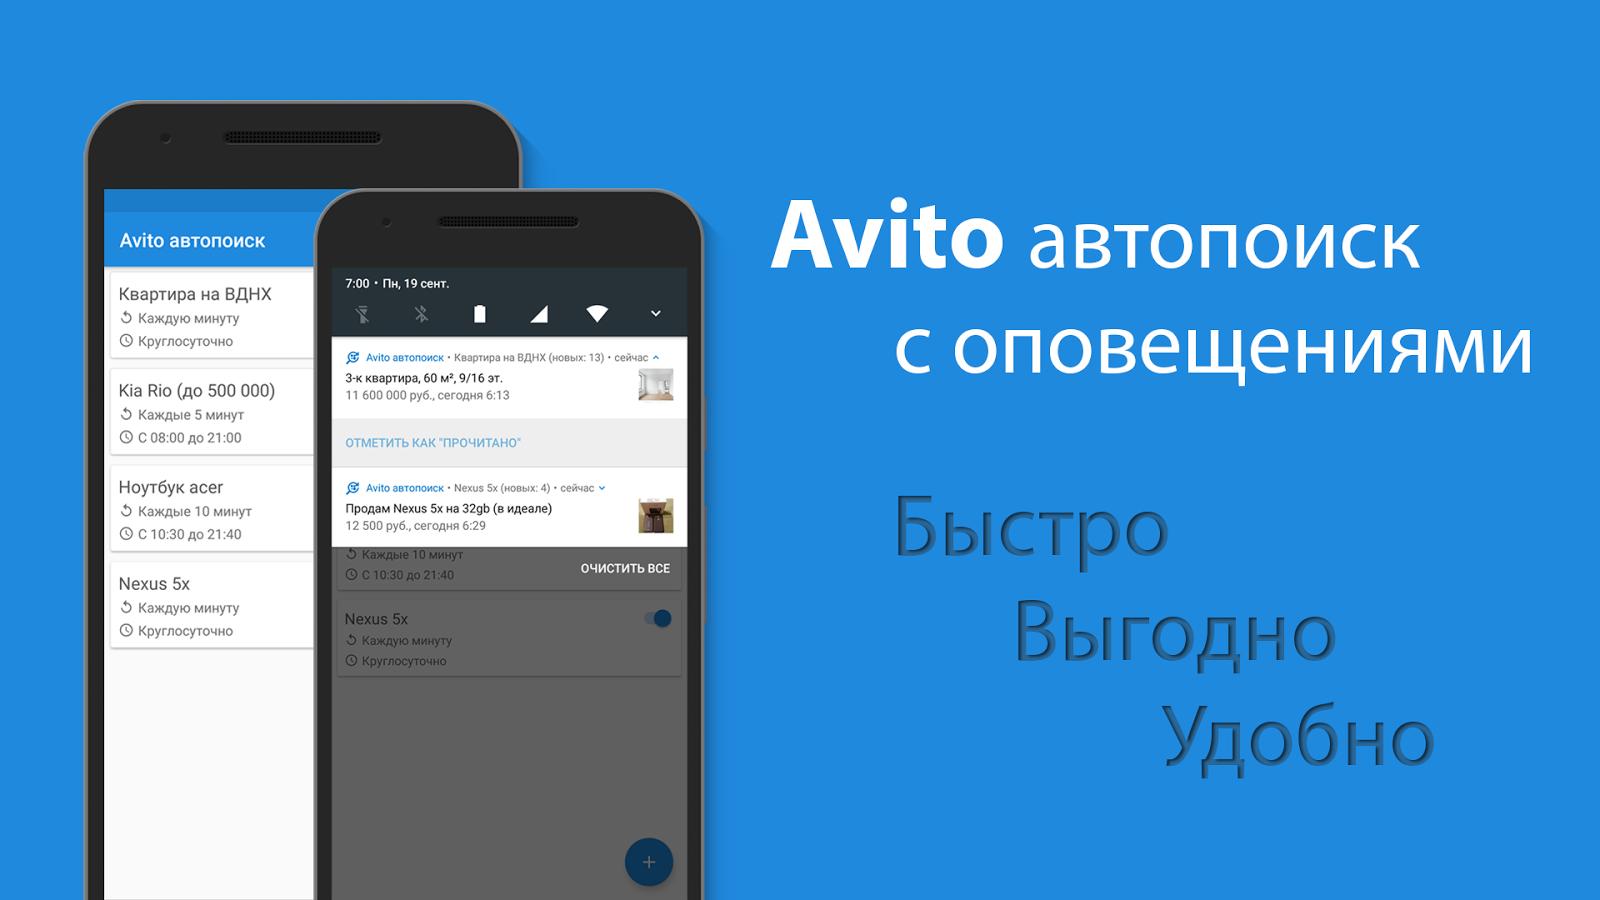 Avito скачать для андроид